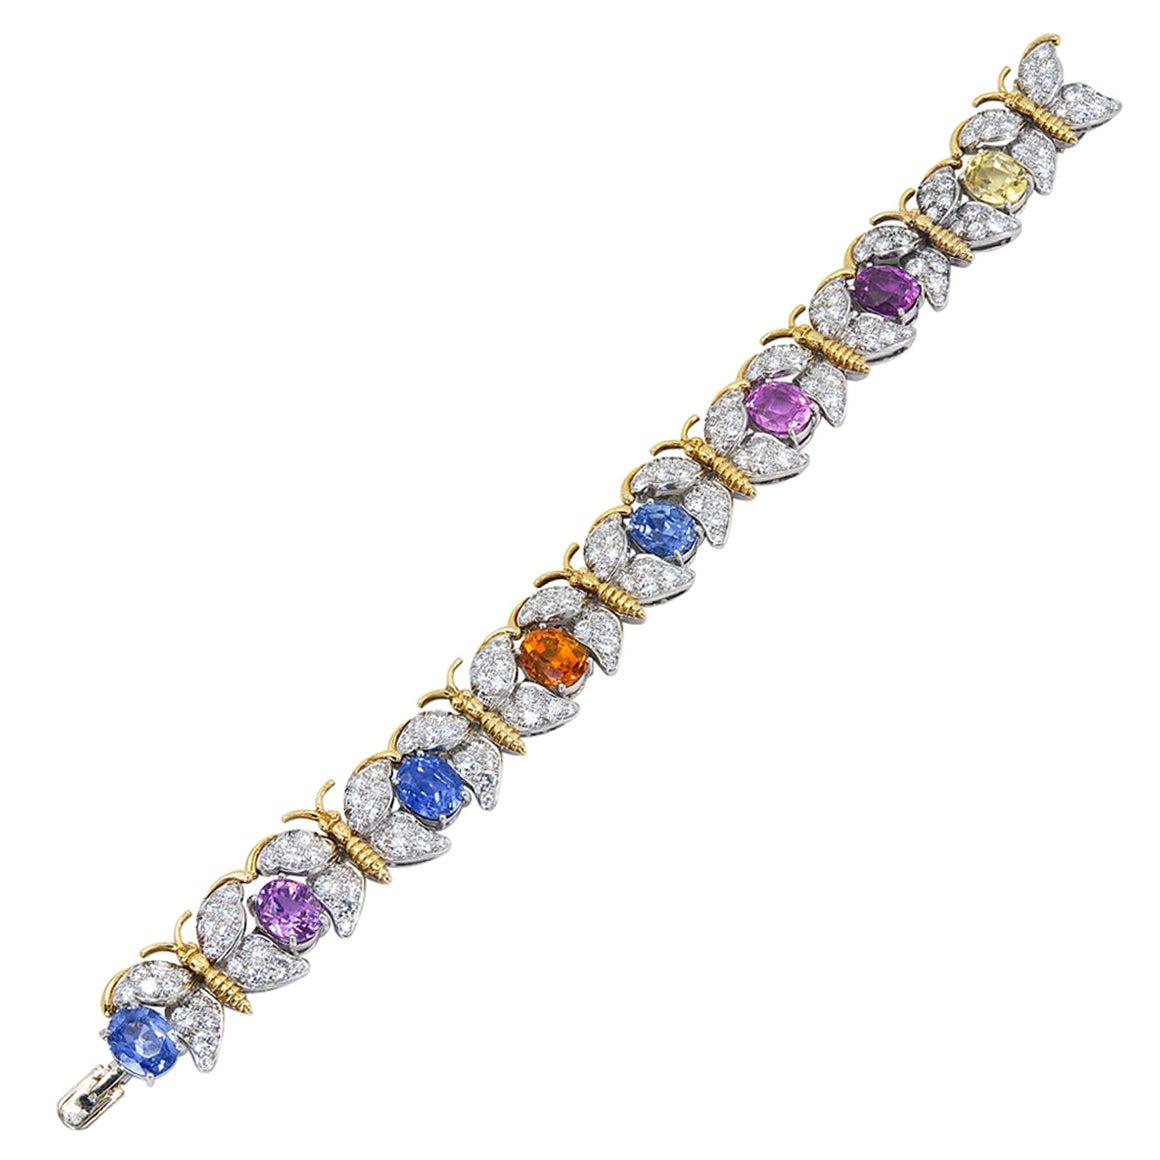 Tiffany & Co. Multi-Color Sapphire, Diamond Bracelet